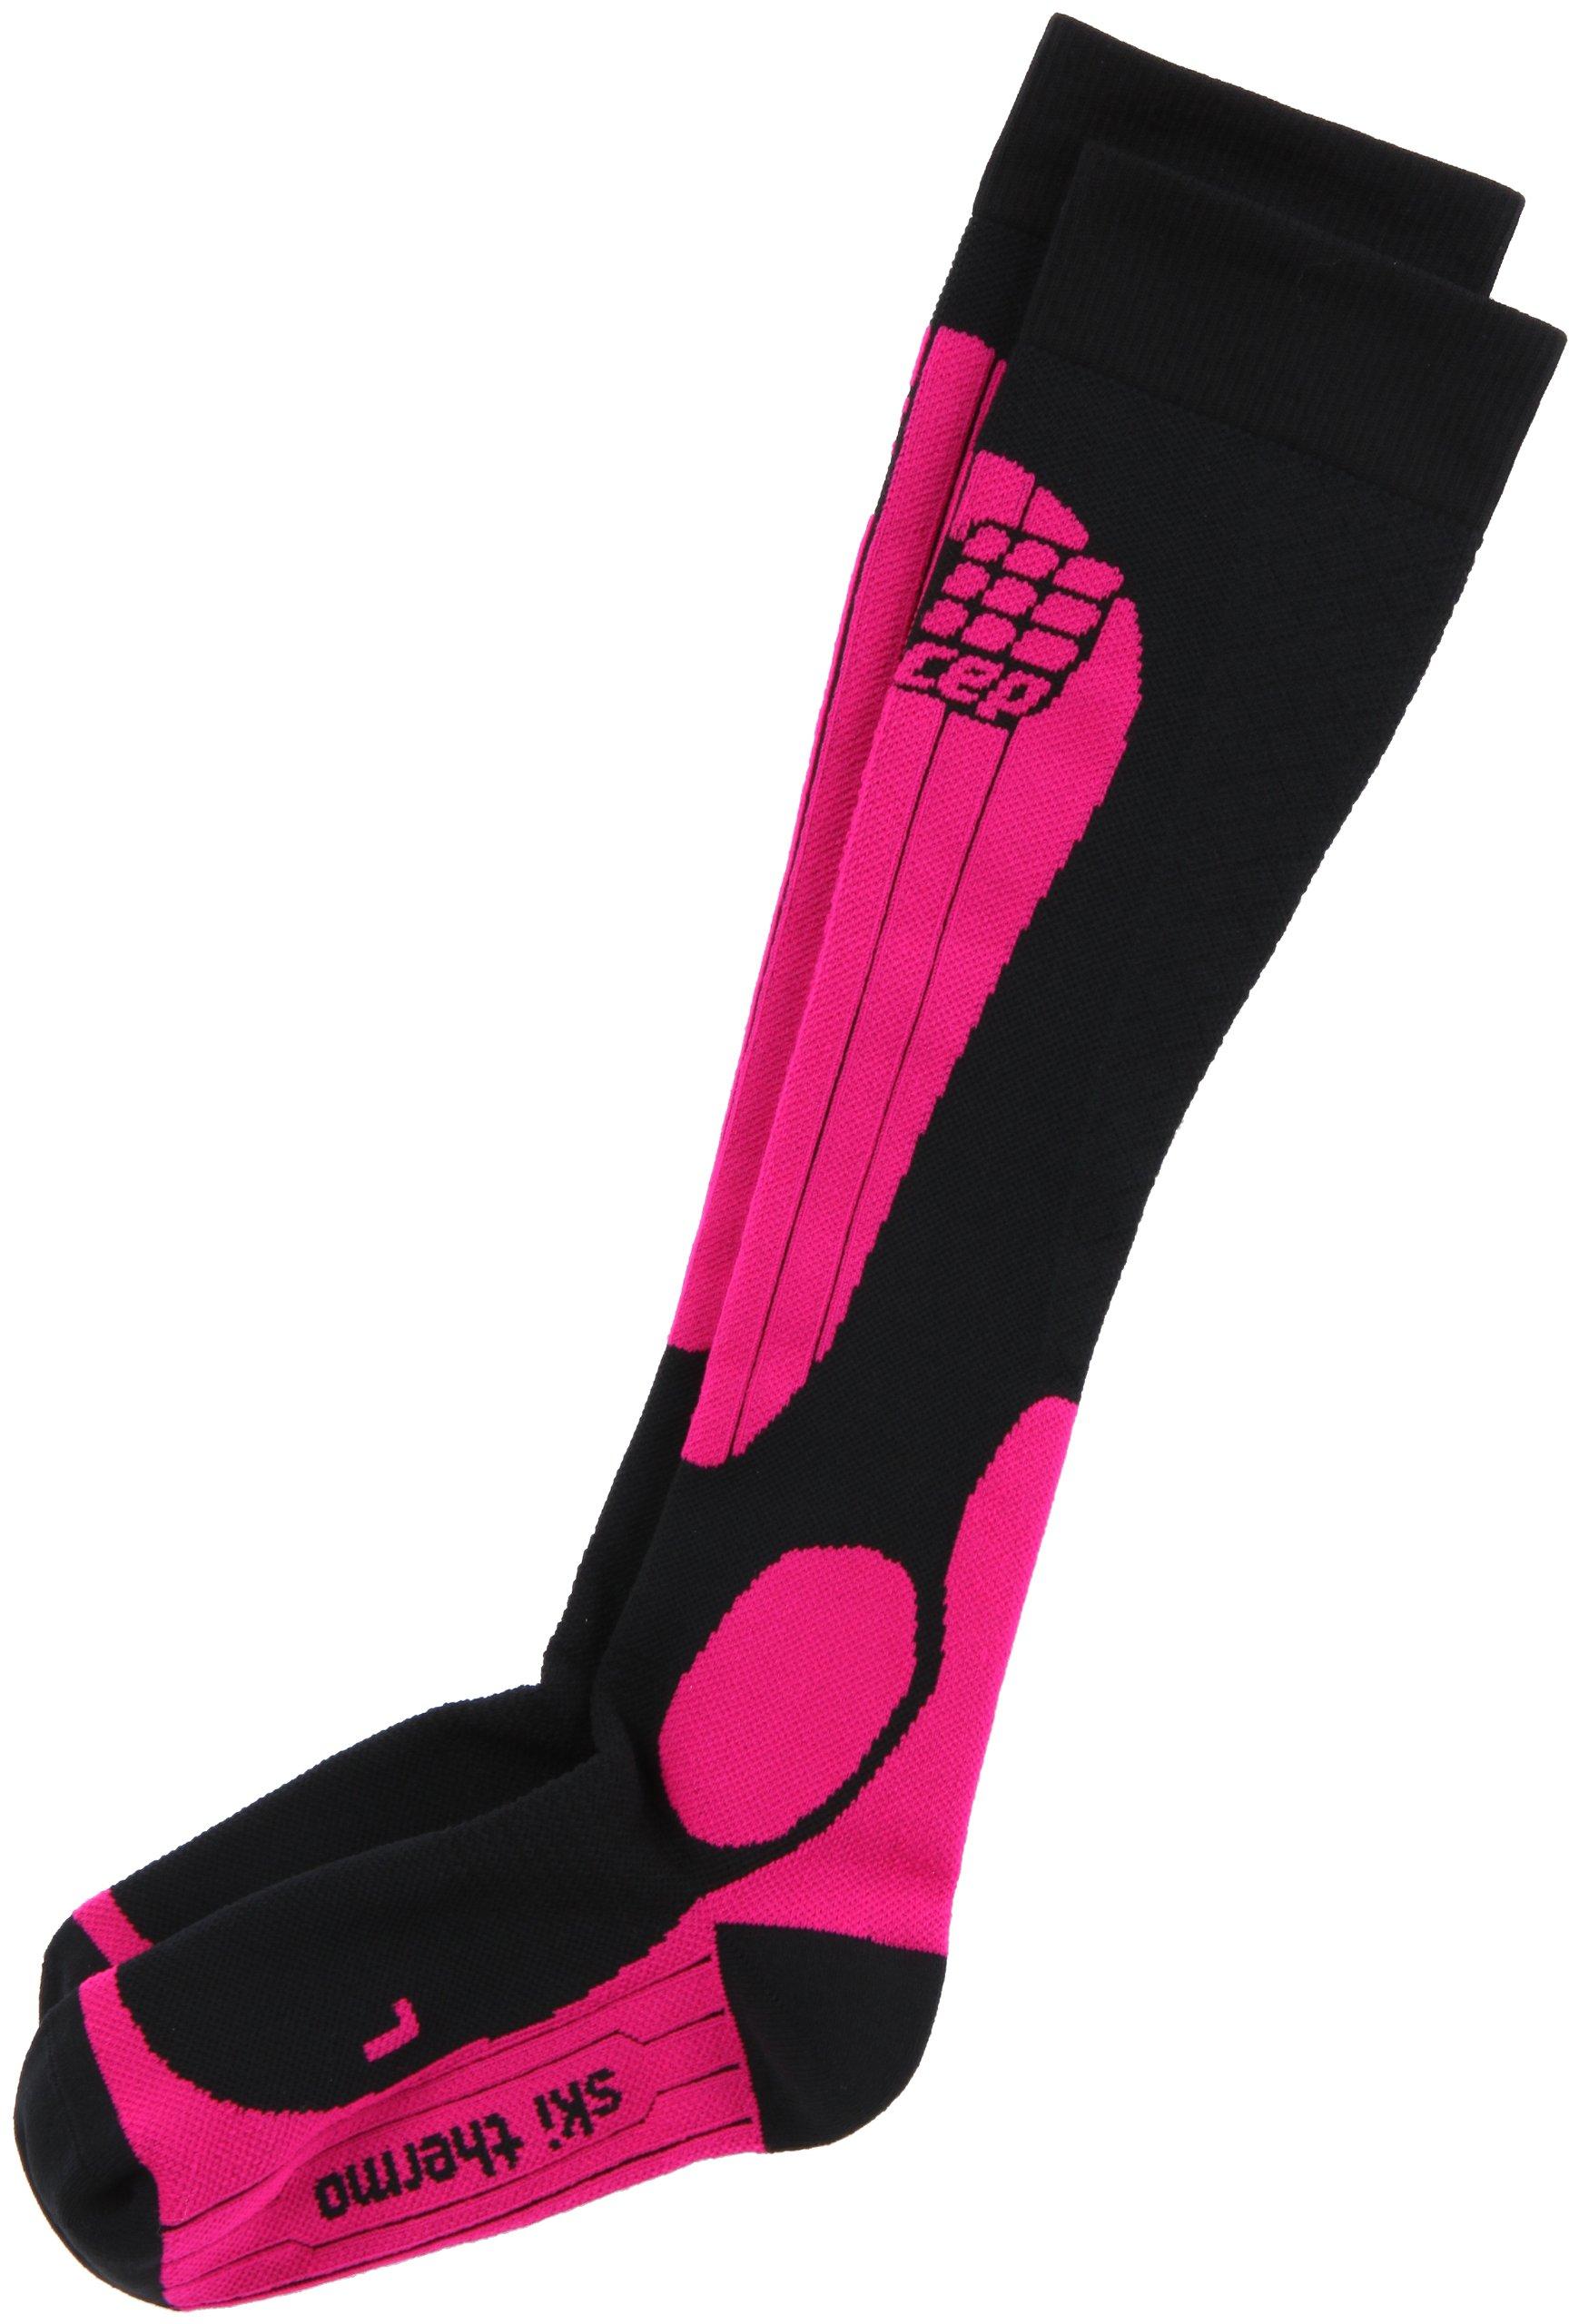 CEP Women's Progressive+ Thermo Ski Socks, Size III (Calf 12.5-15-Inch), Black/Pink